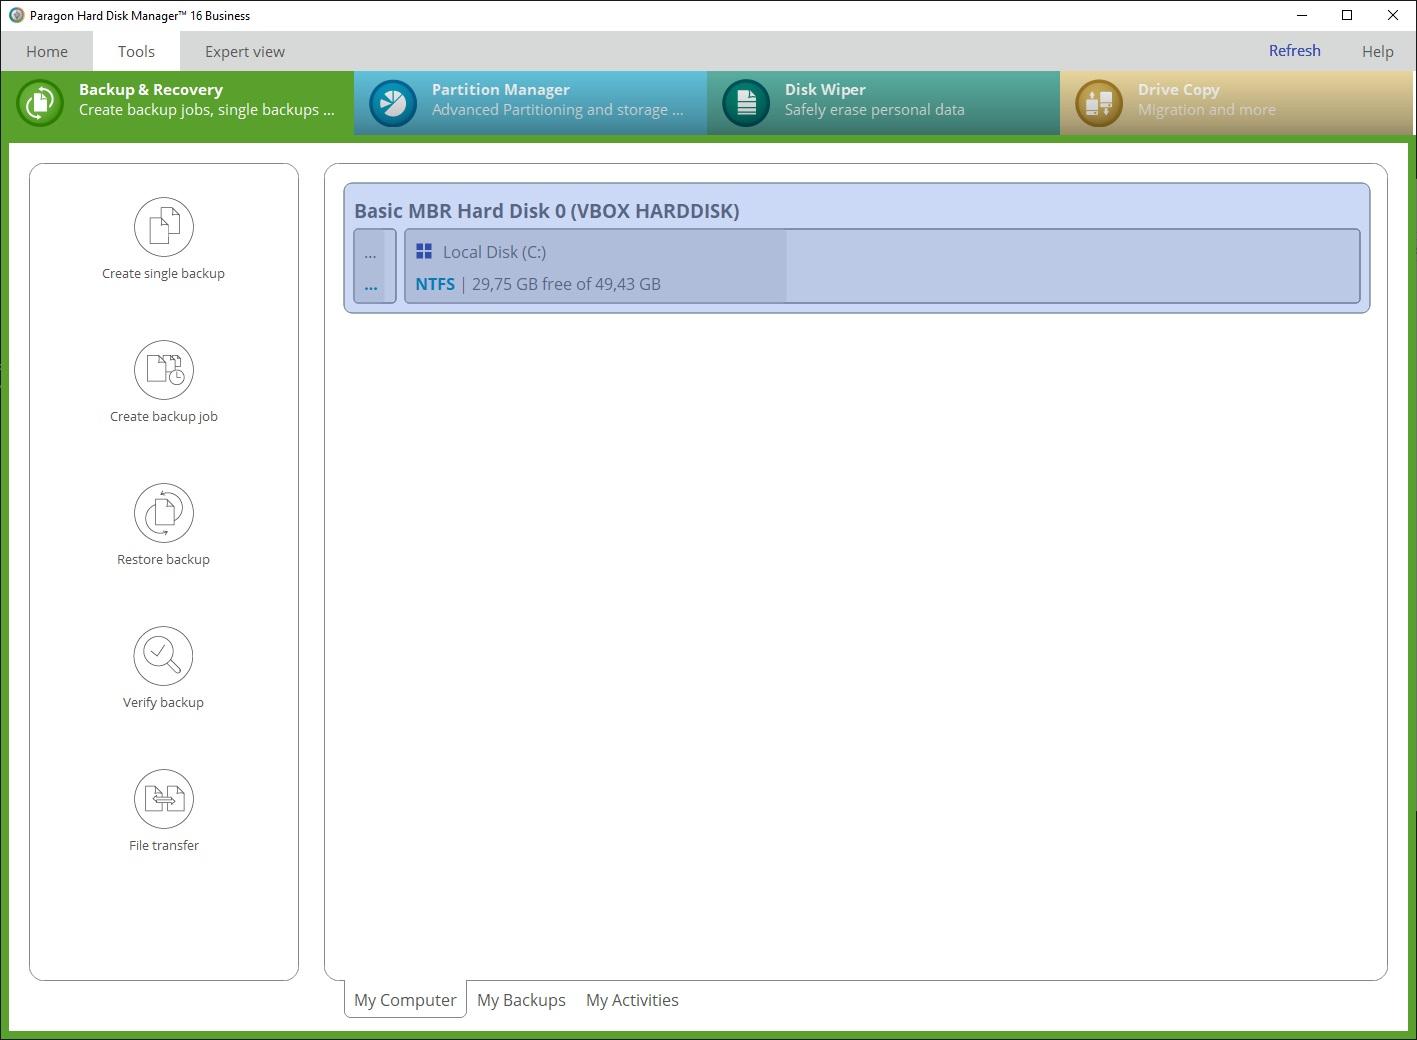 Paragon Hard Disk Manager 16 Business v16.20.1   WinPE - ENG